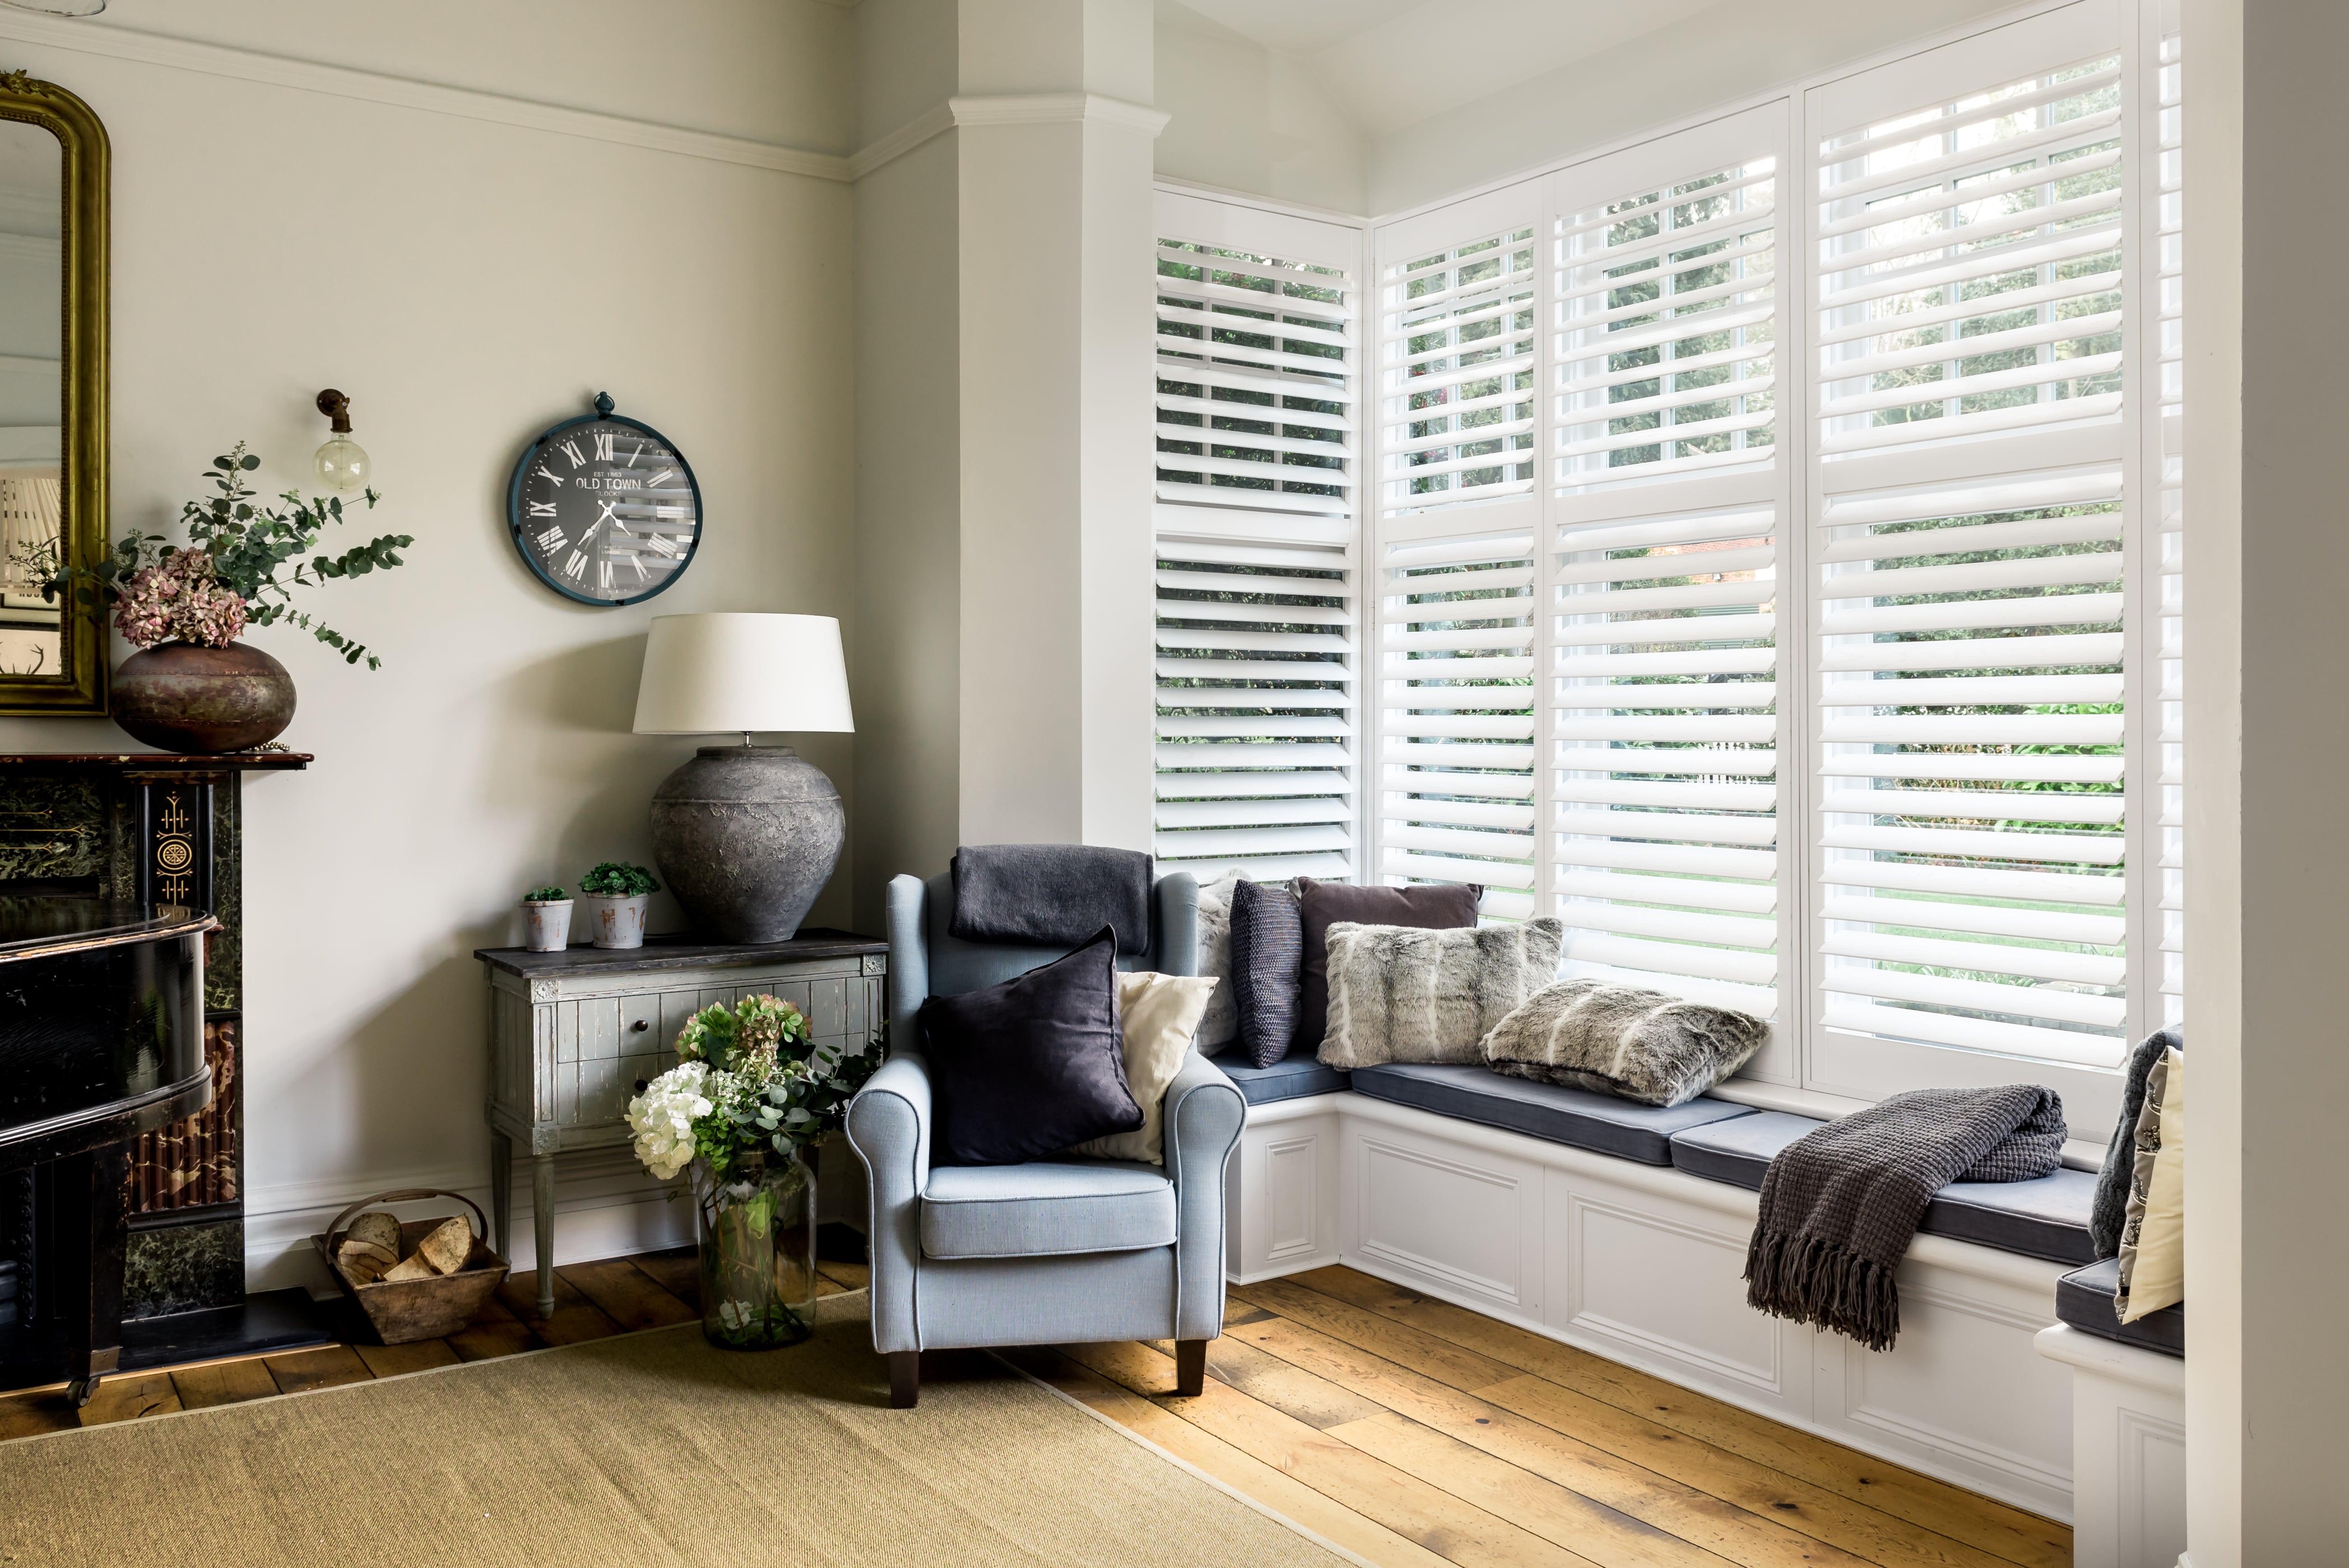 Window seat shutters in soft white